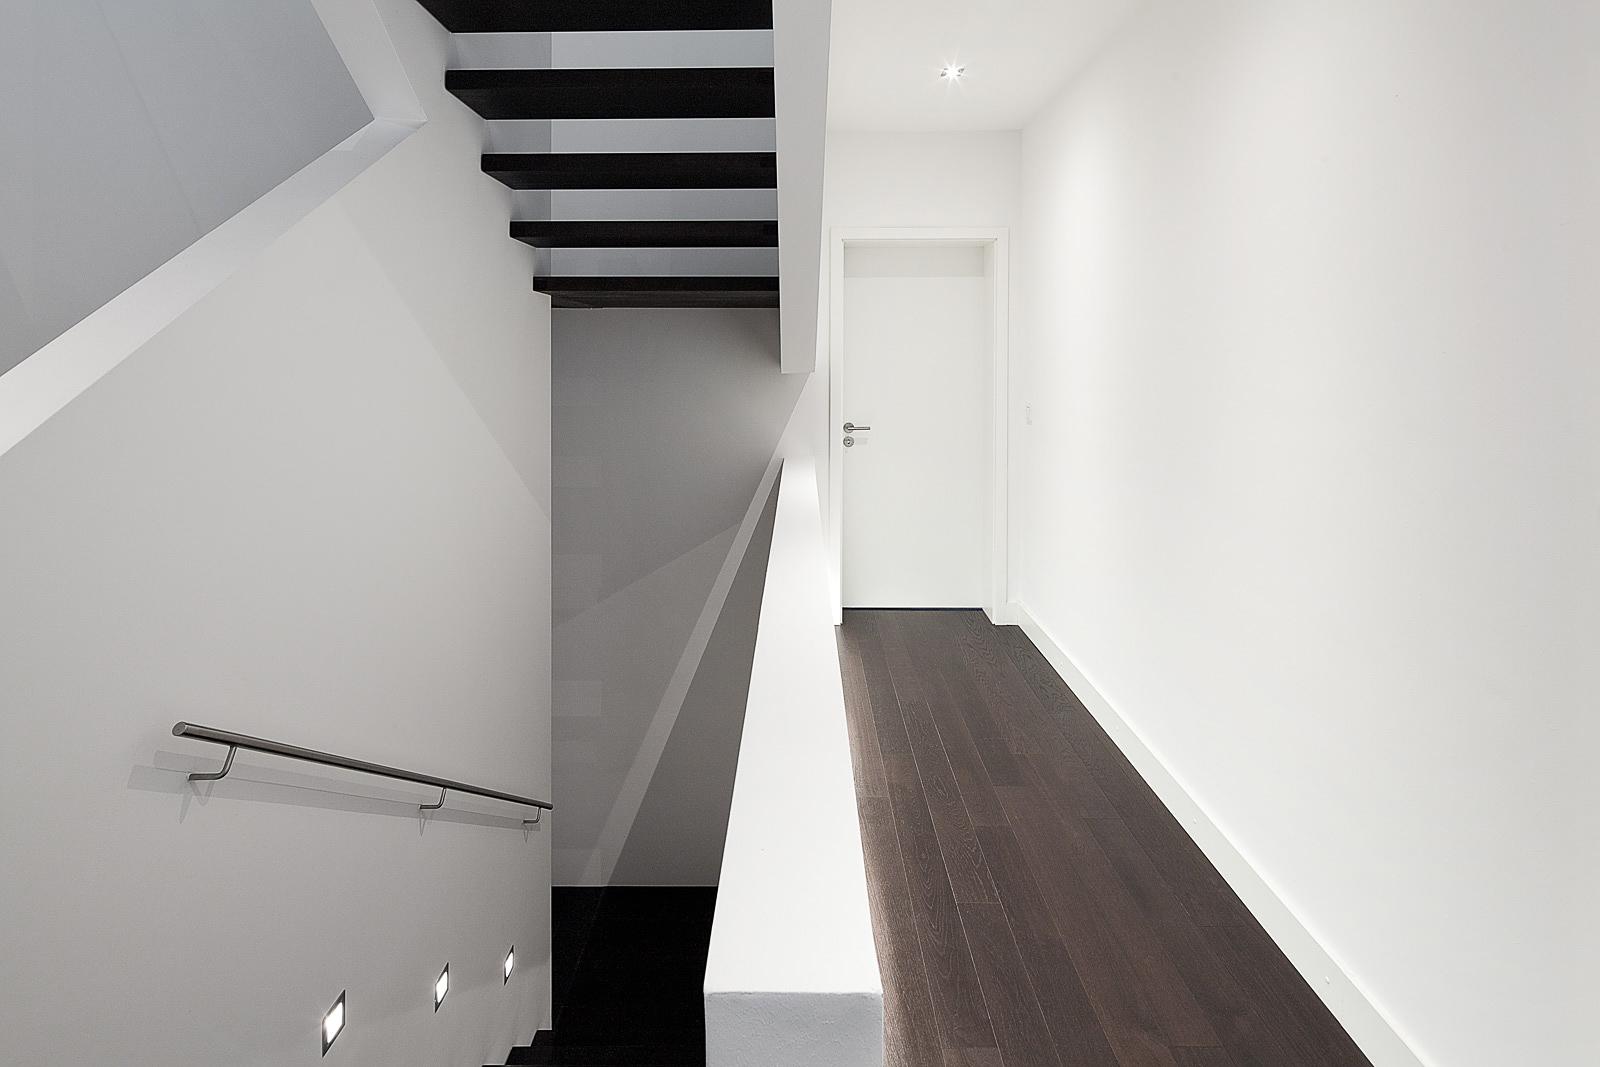 Architektur Fotografie, Treppenhaus Innenaufnahme